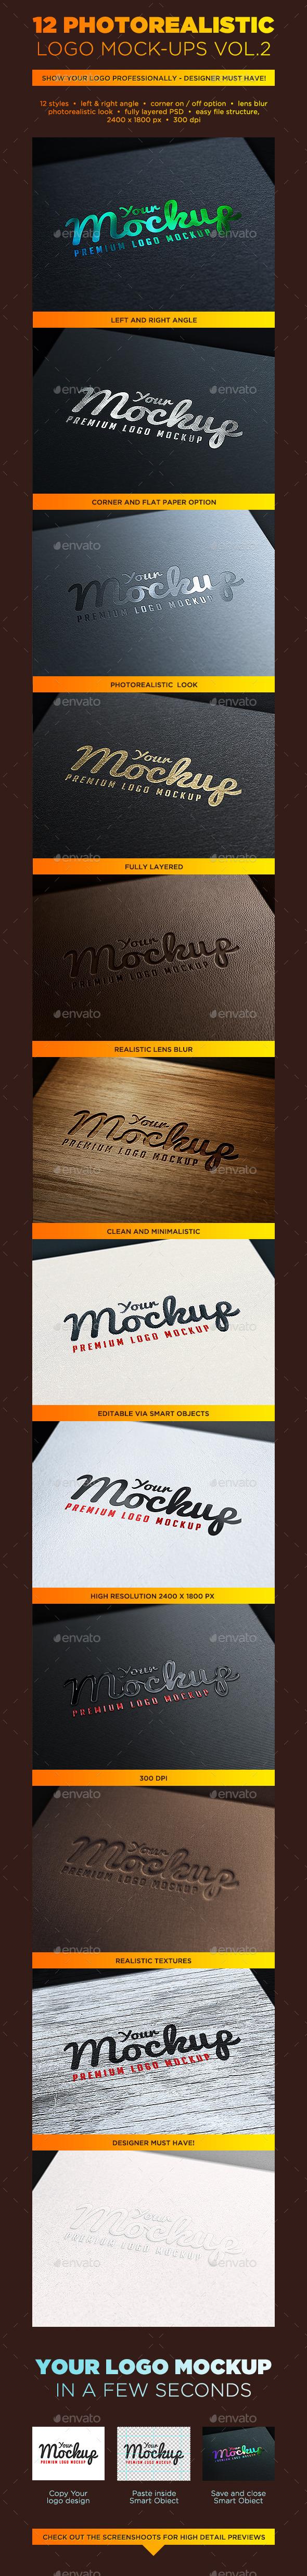 GraphicRiver Your Mockup Logo Mockups VOL.2 10204190